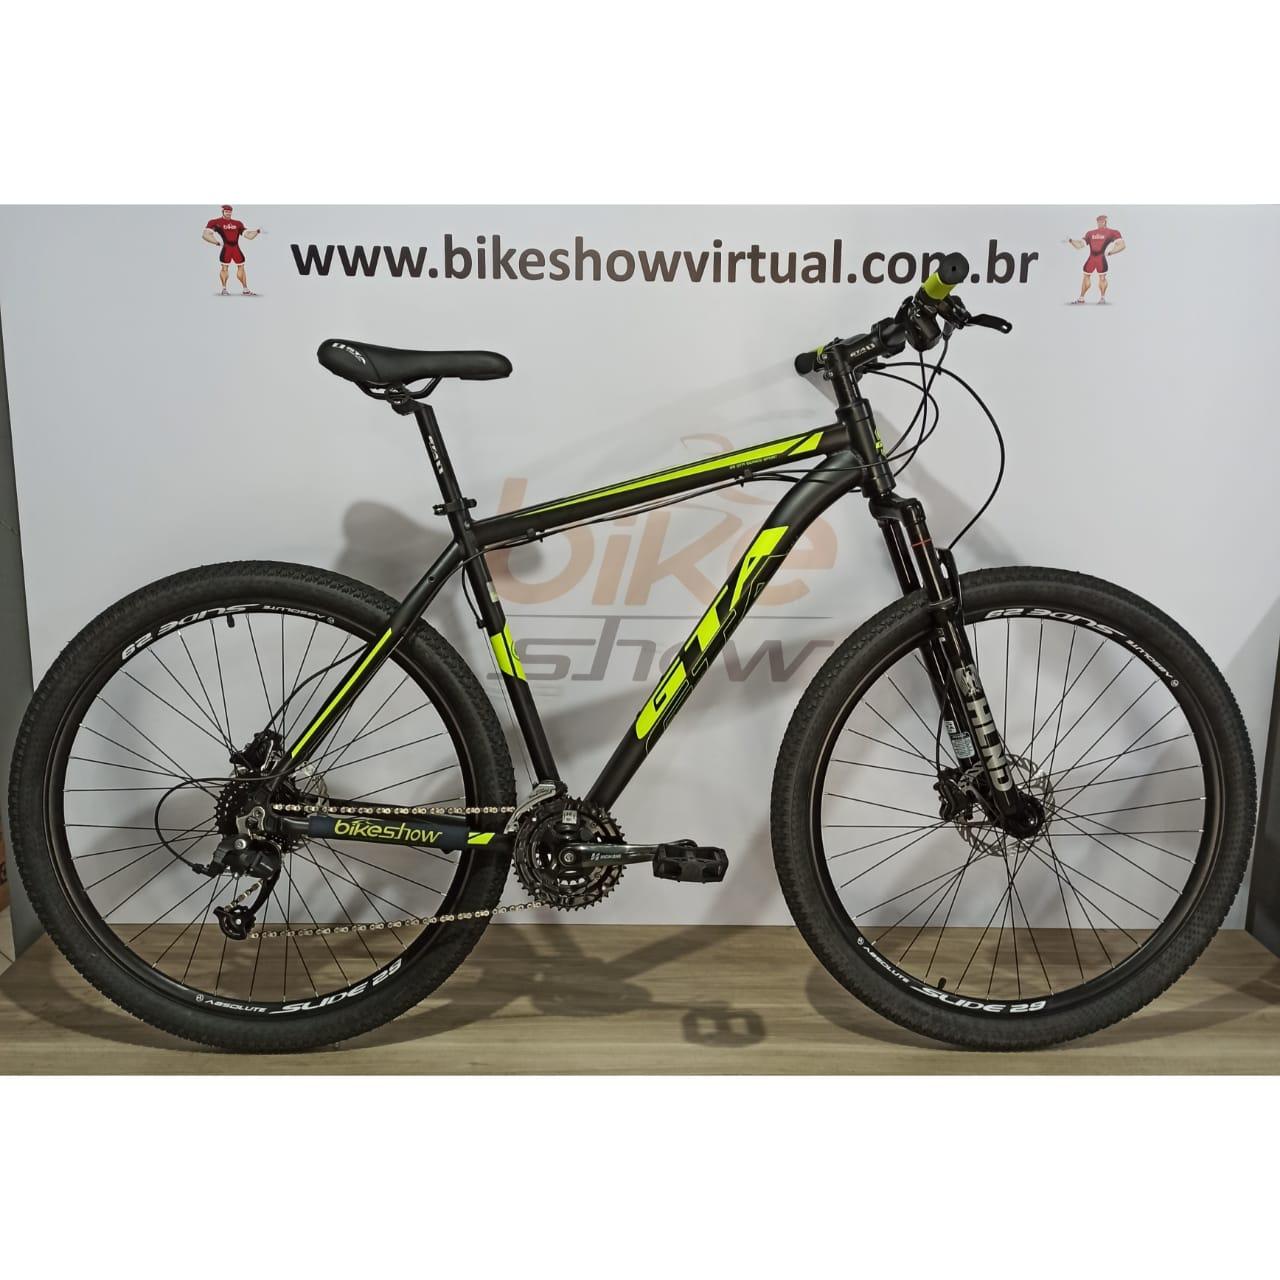 Bicicleta GTA NX11 aro 29 - 24v Microshift - Freio GTA Hidráulico - Suspensão HLND